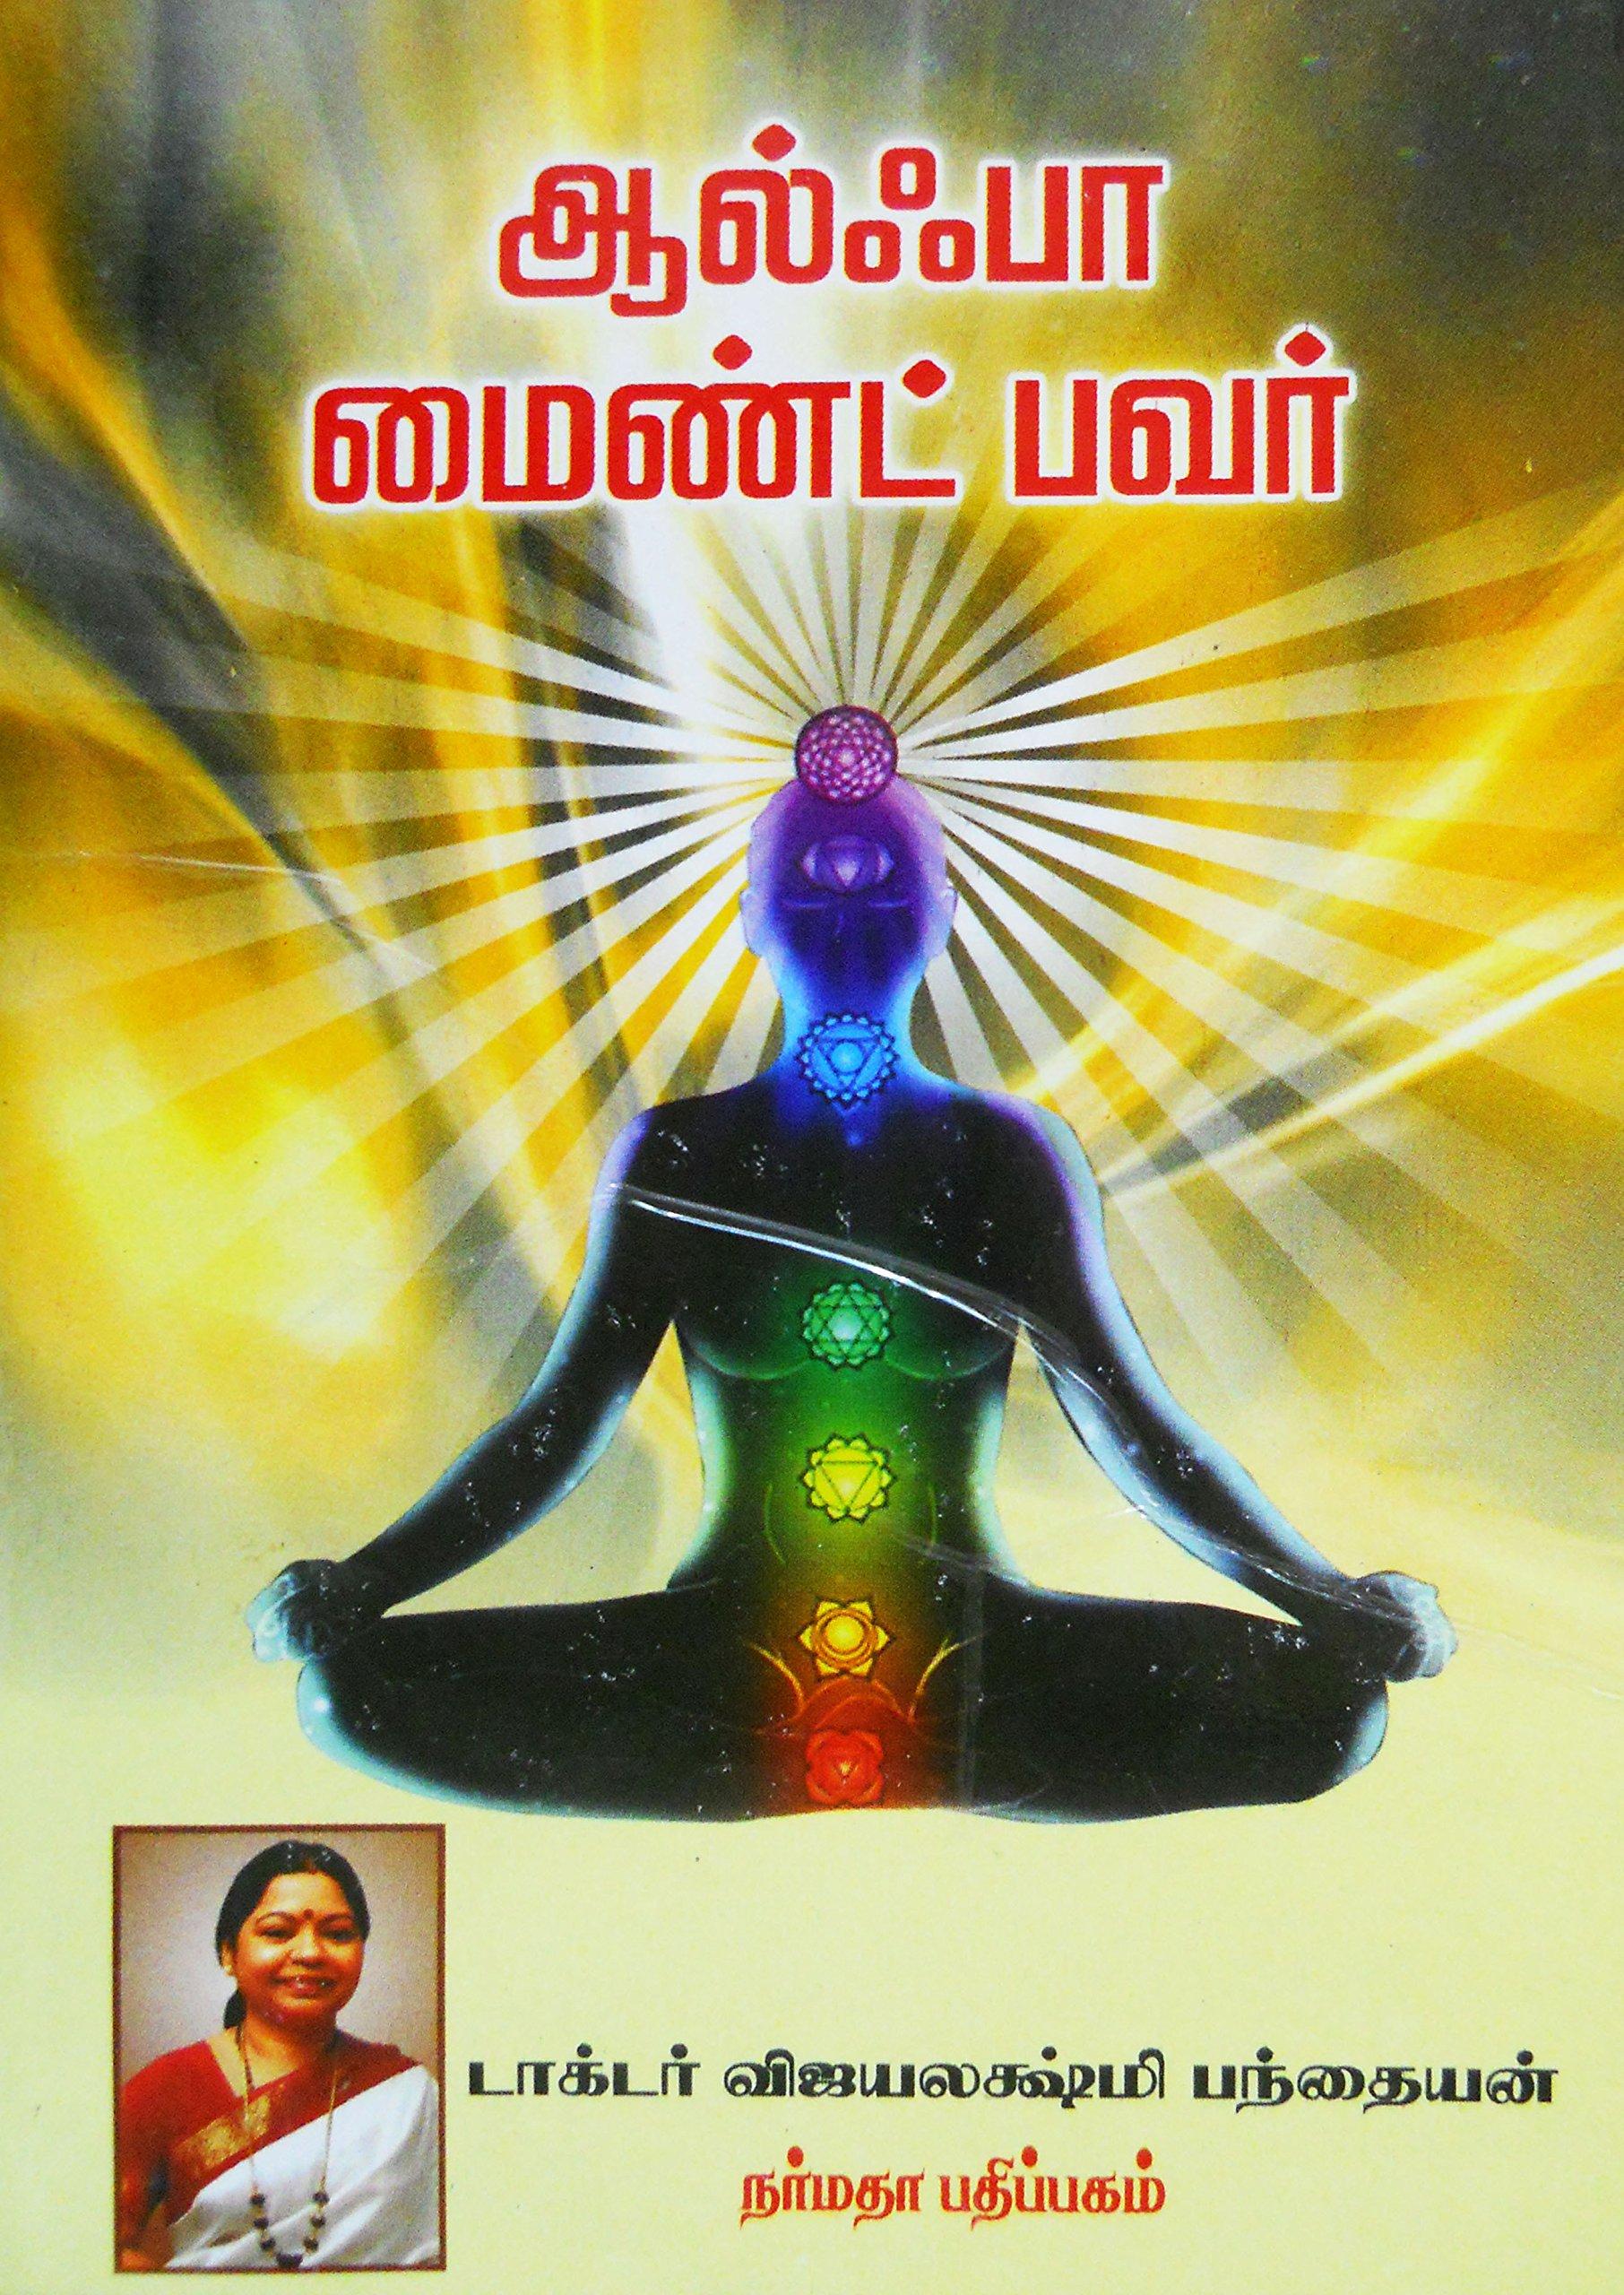 Osho tamil quotes | meditation | tamil | osho youtube.